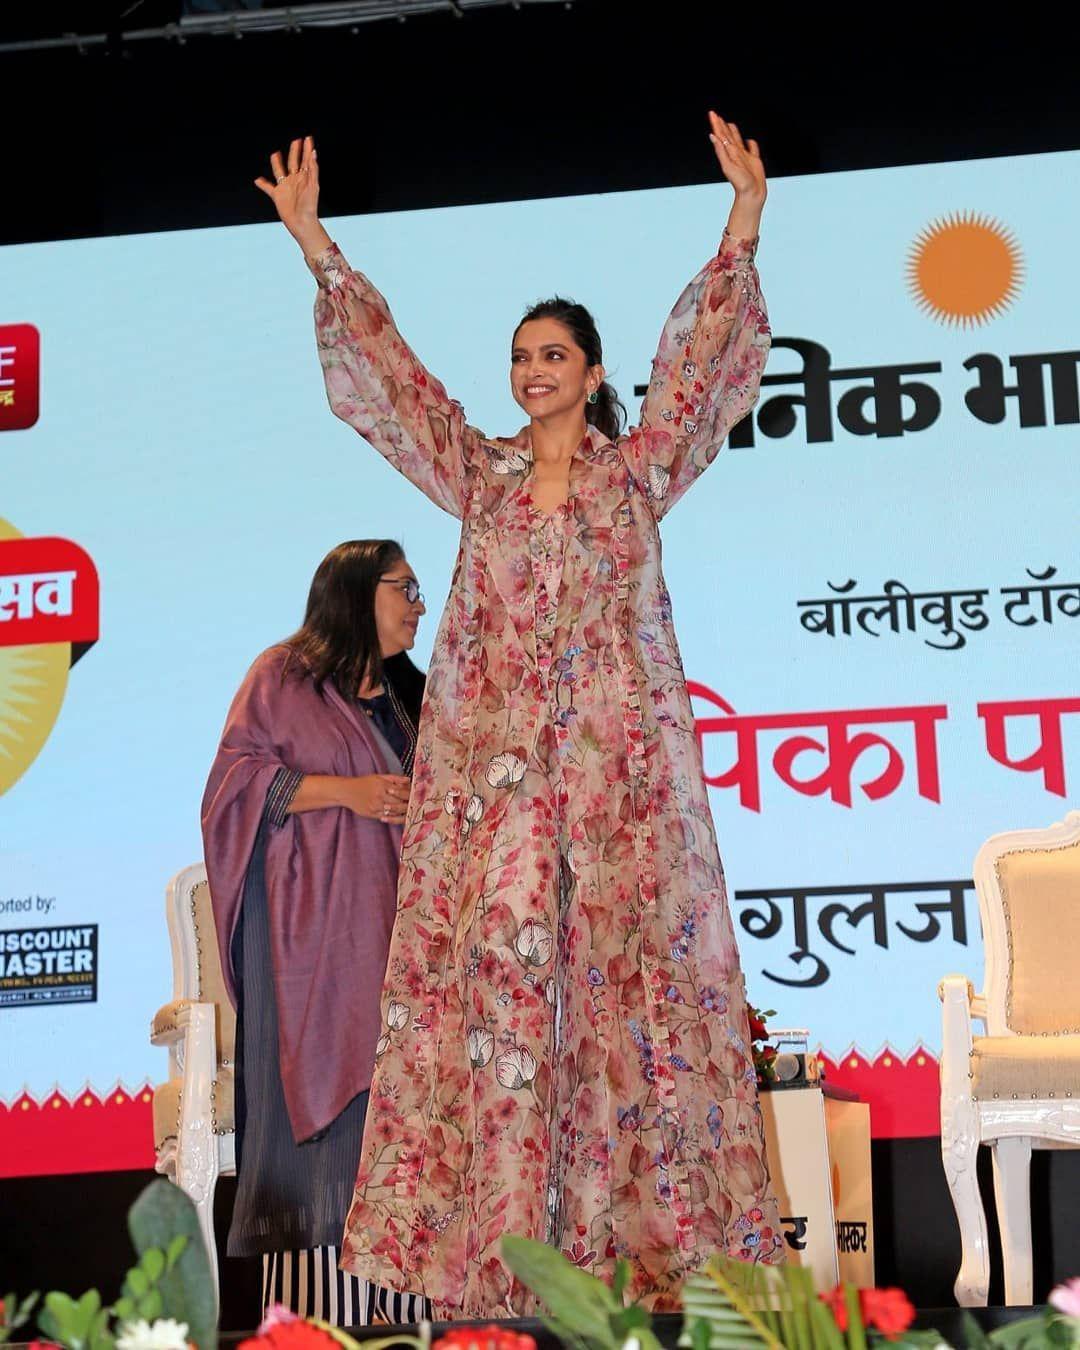 Watch Deepika Padukone Gracefully Dances To Nagada Sang Dhol At Dainik Bhaskar Utsav In Jaipur Today Hungryboo Fashion Clothes Women Deepika Padukone Bollywood Fashion